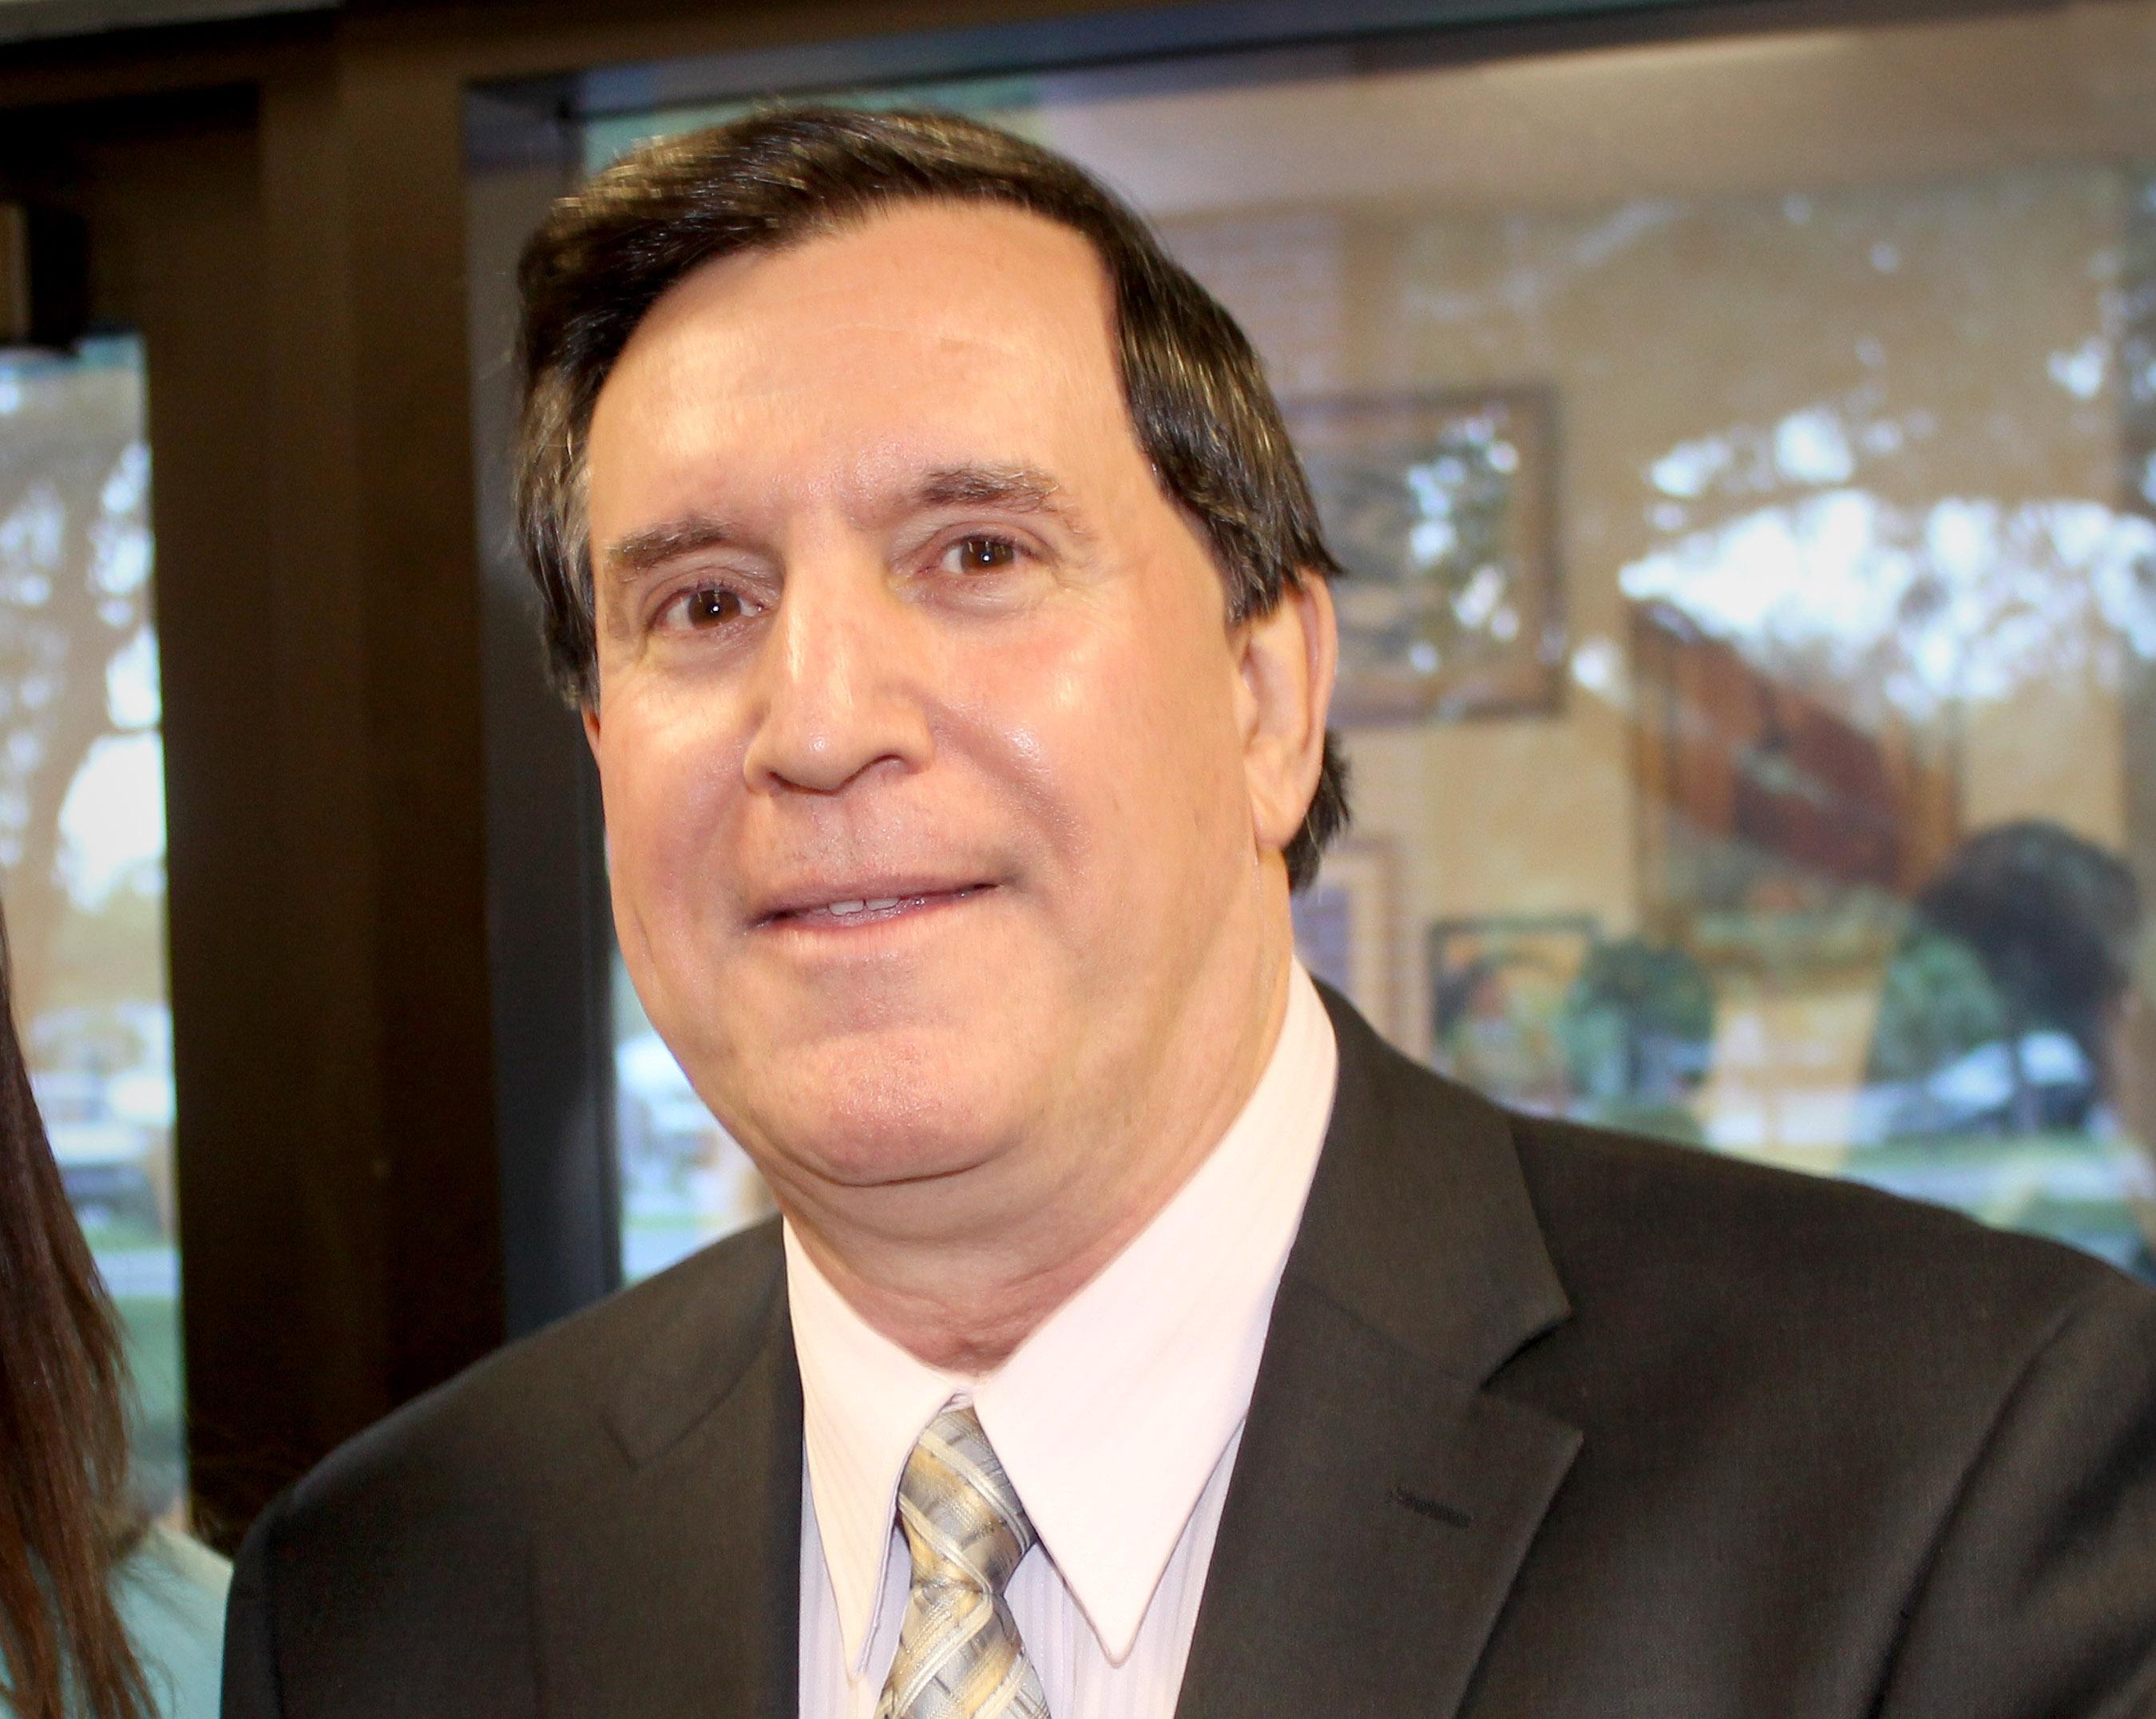 4976b2f0b3c Investors Bill O. Fuller and Martin Pinilla II filed a complaint against  Miami City Commissioner Joe Carollo for alleged harassment.